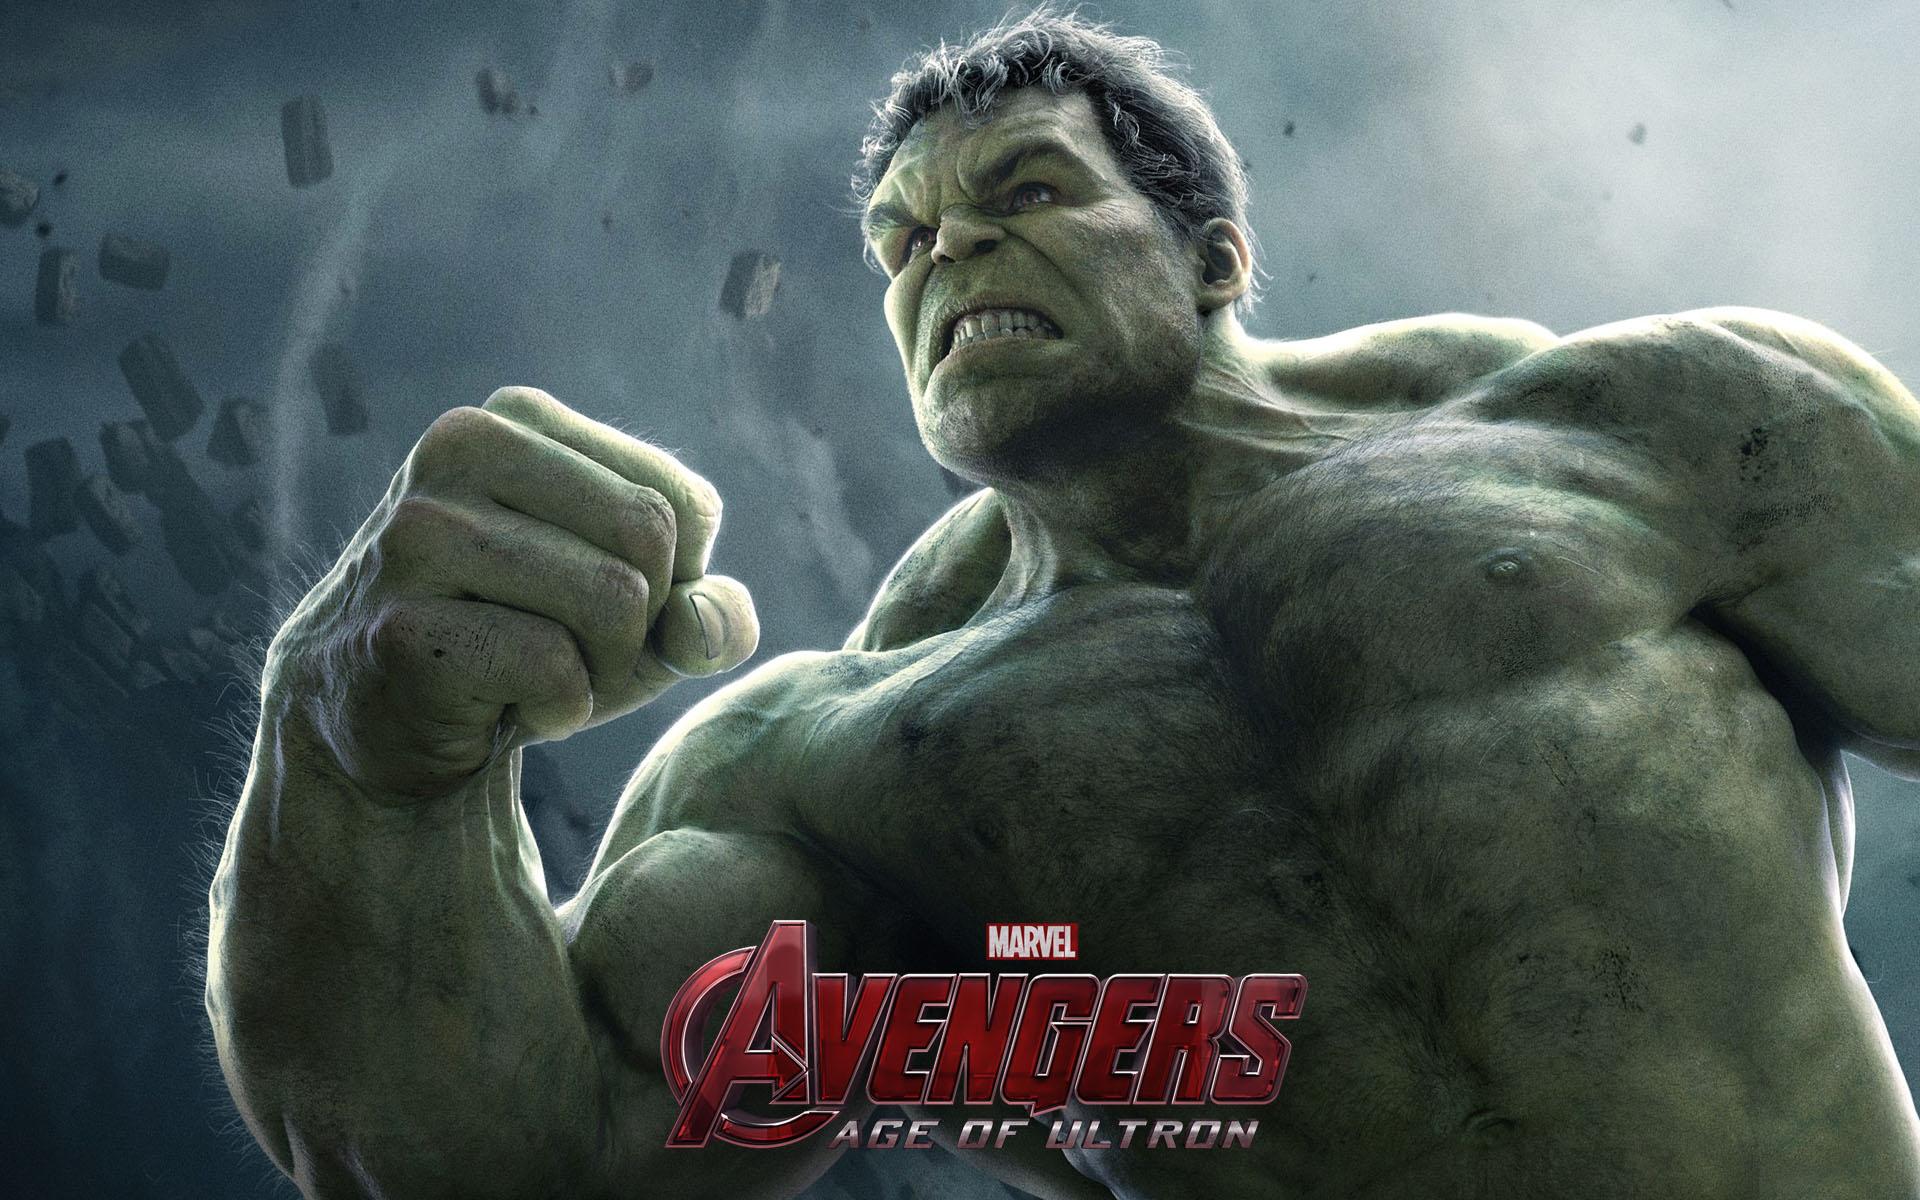 Avengers 2 Age Of Ultron Movie Showcase One Track Mine